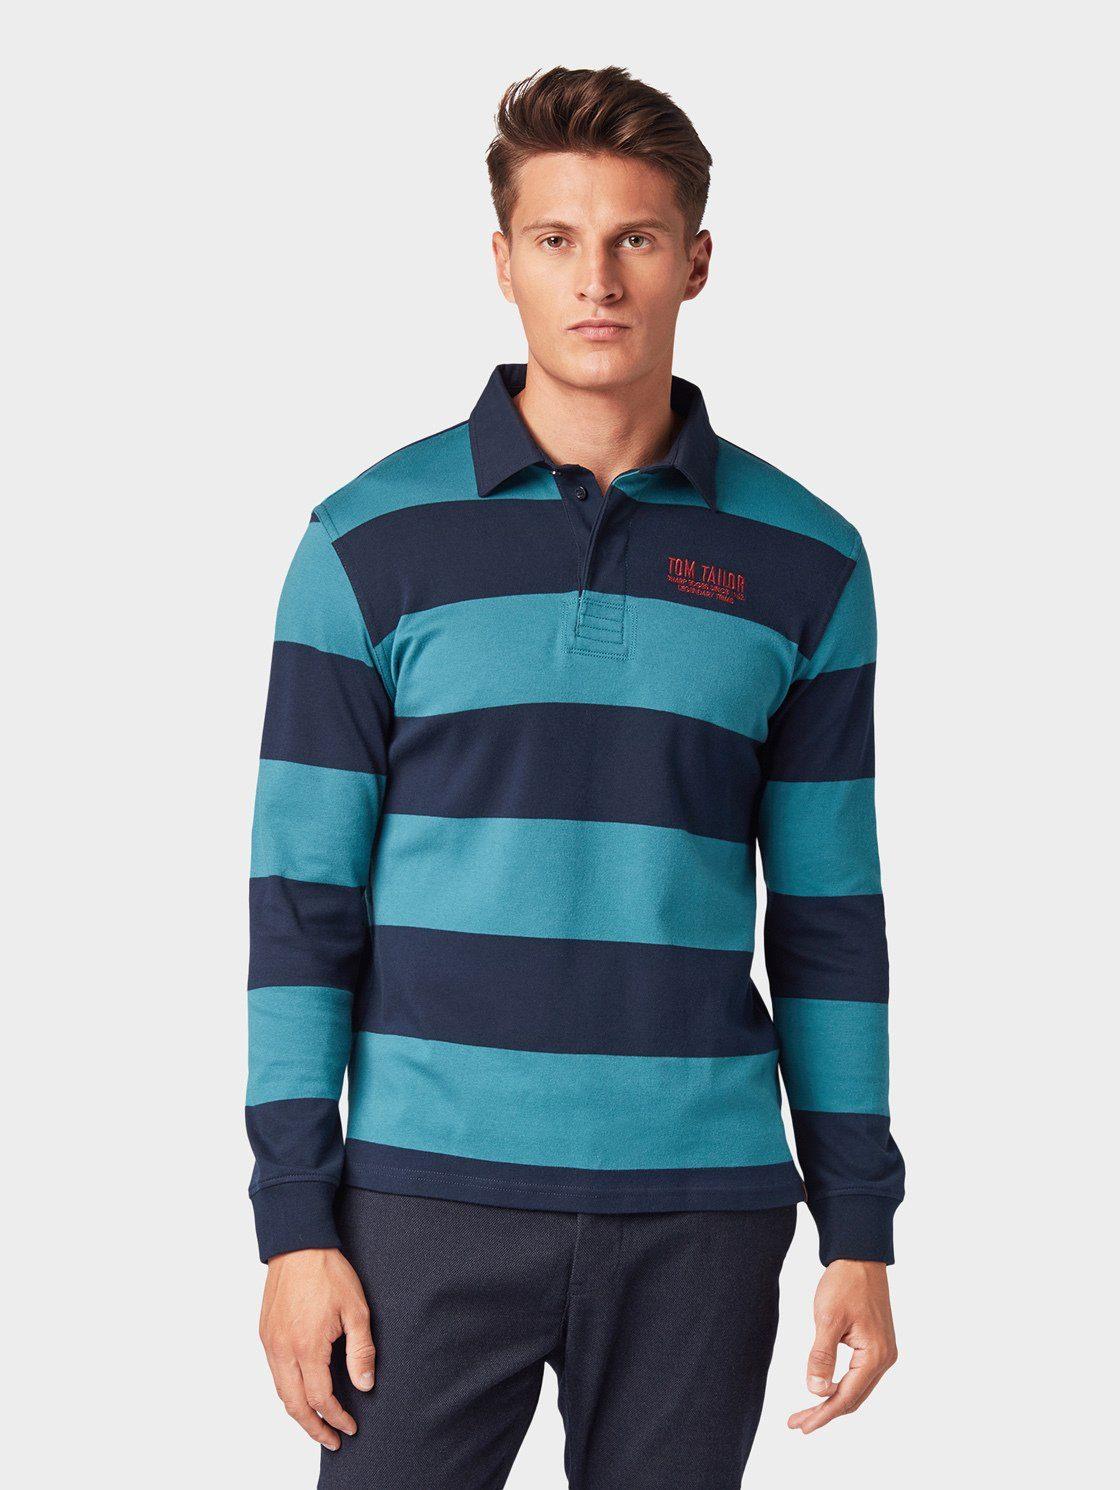 TOM TAILOR Poloshirt »Gestreiftes Langarm Poloshirt« online kaufen | OTTO